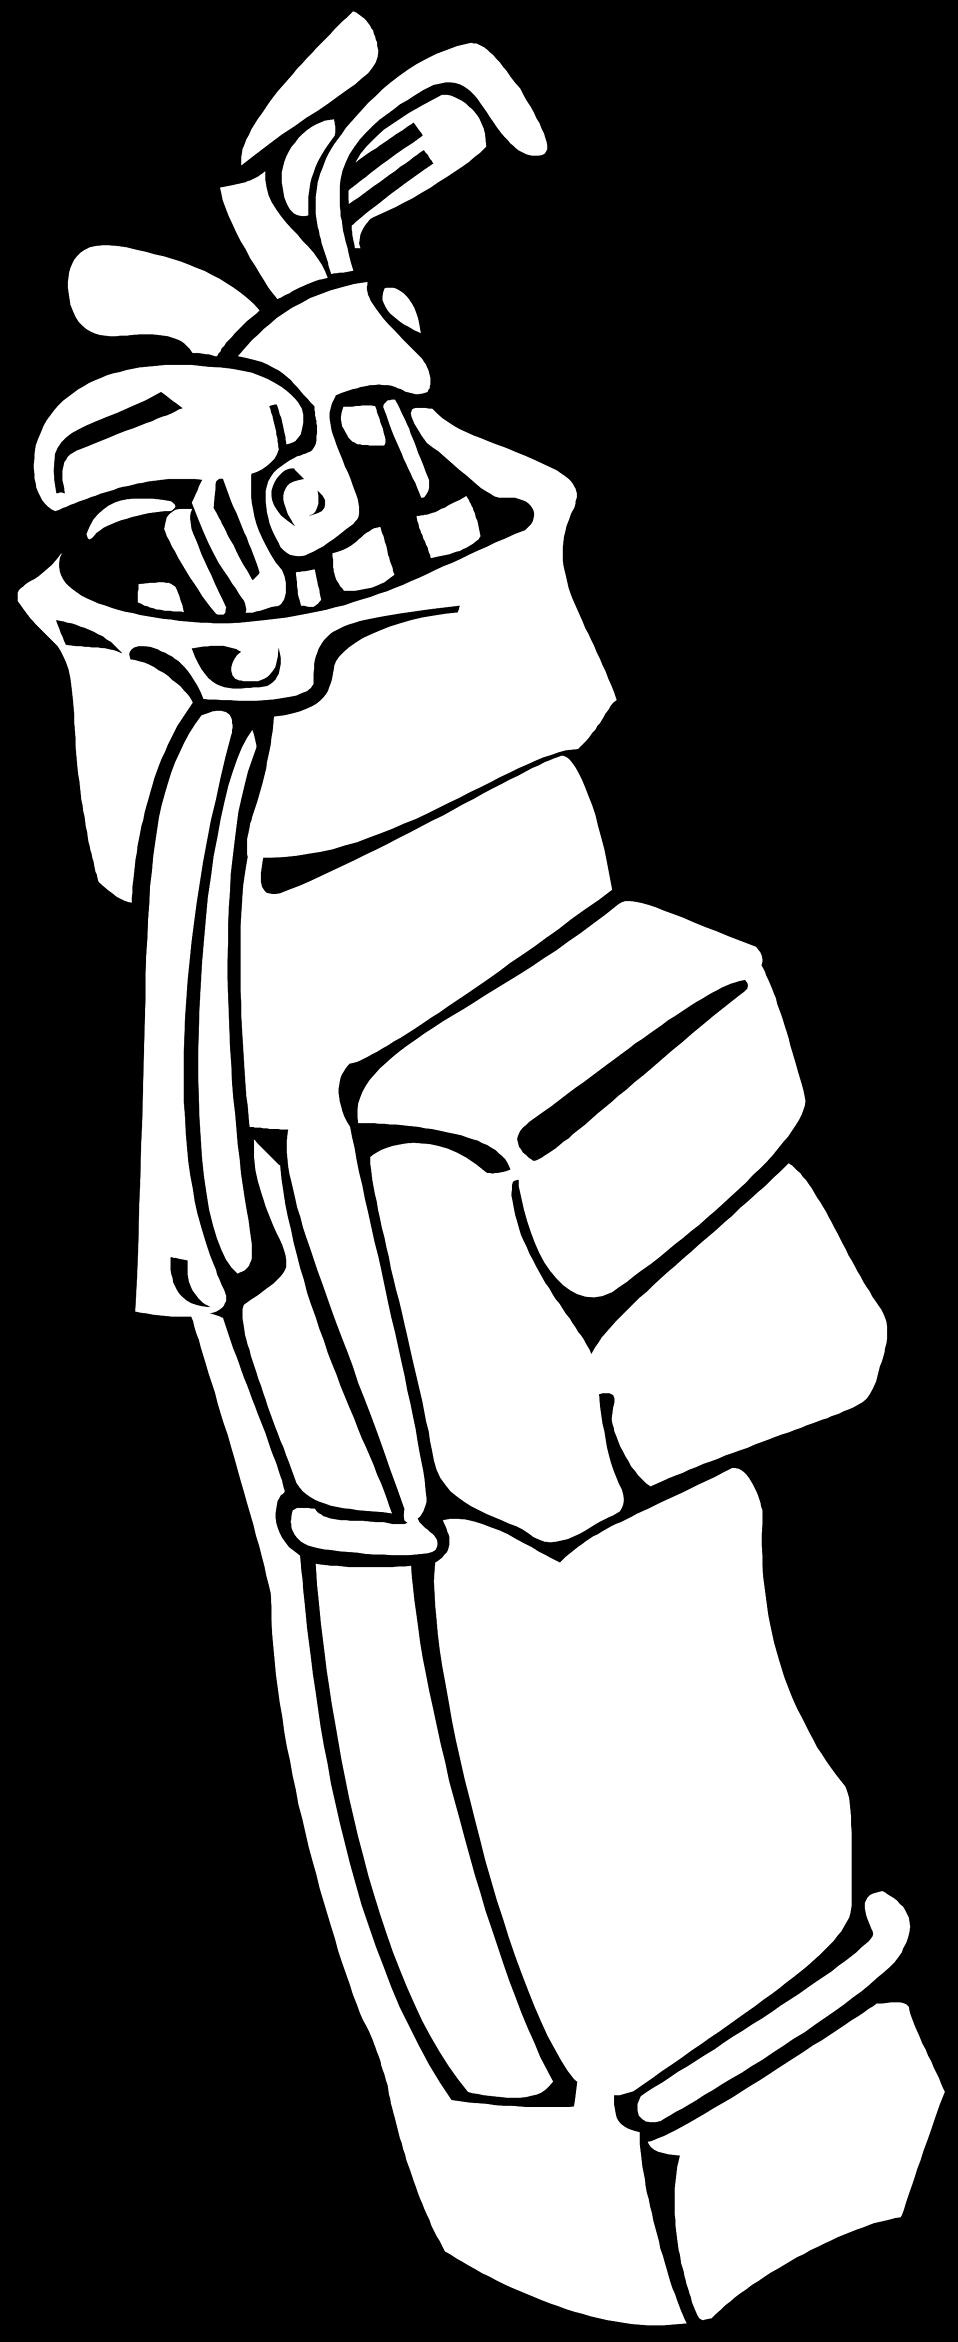 Golf bag at getdrawings. Golfer clipart pencil drawing